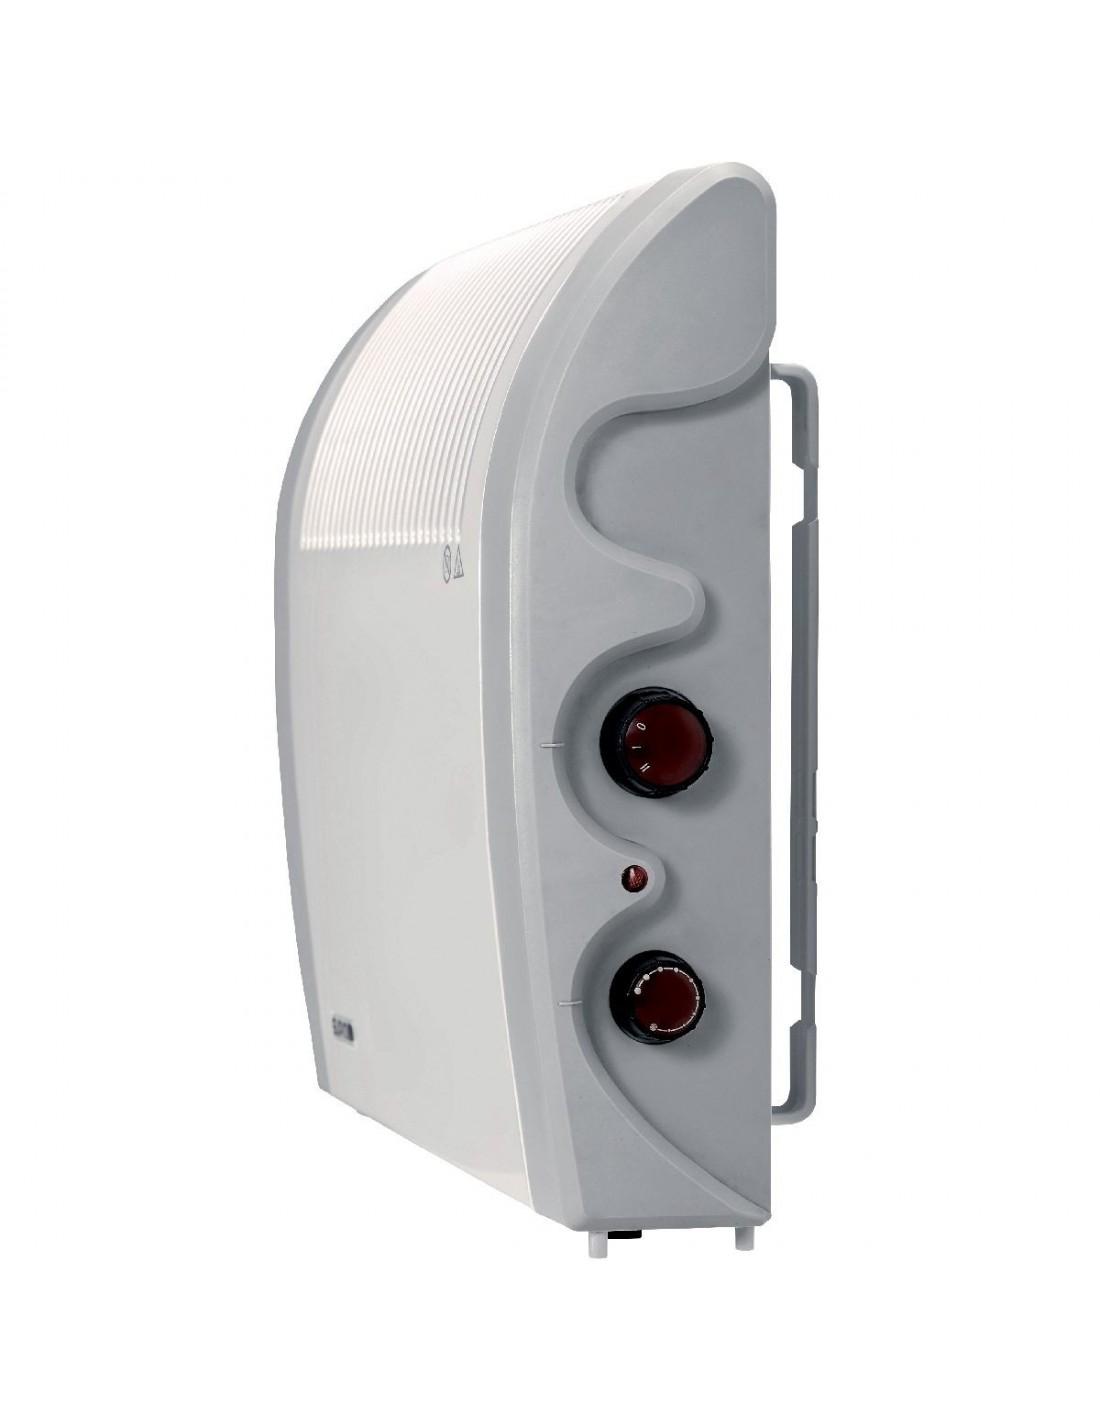 convecteur mobile quickmix 2 2000w. Black Bedroom Furniture Sets. Home Design Ideas